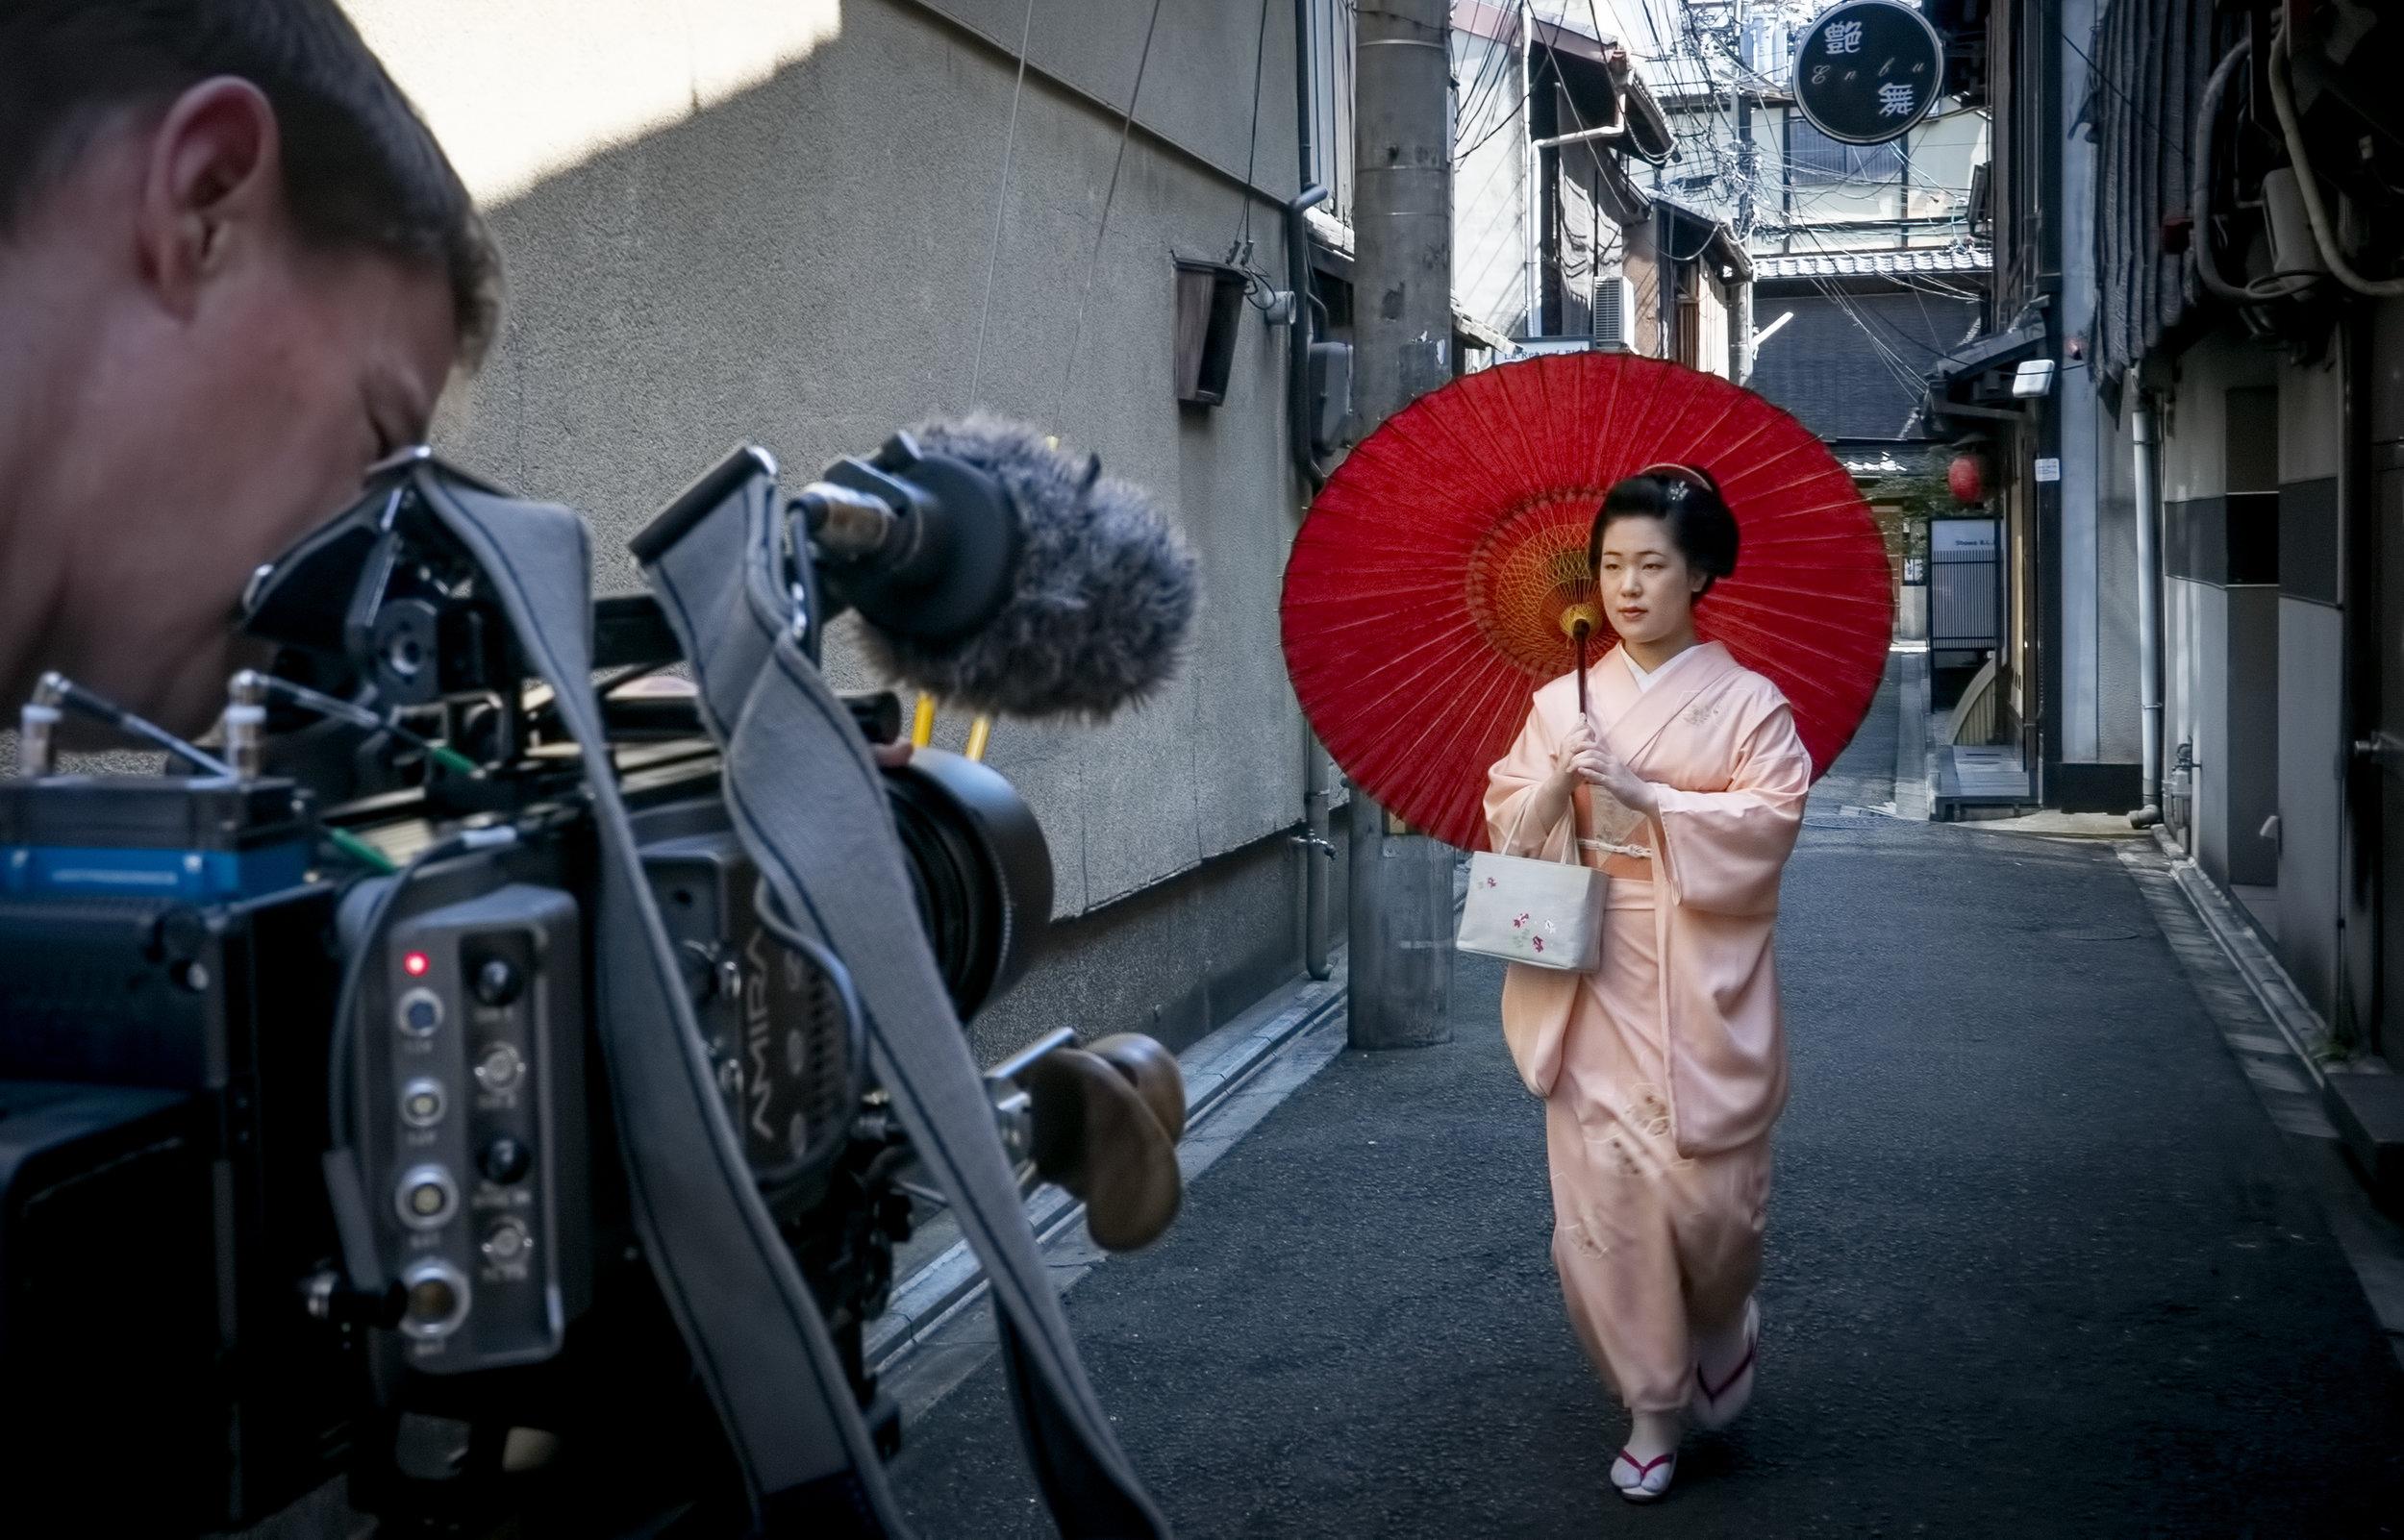 filming Maiko in Kyoto, Van Gogh & Japan © EXHIBITION ON SCREEN (David Bickerstaff) (1).jpg